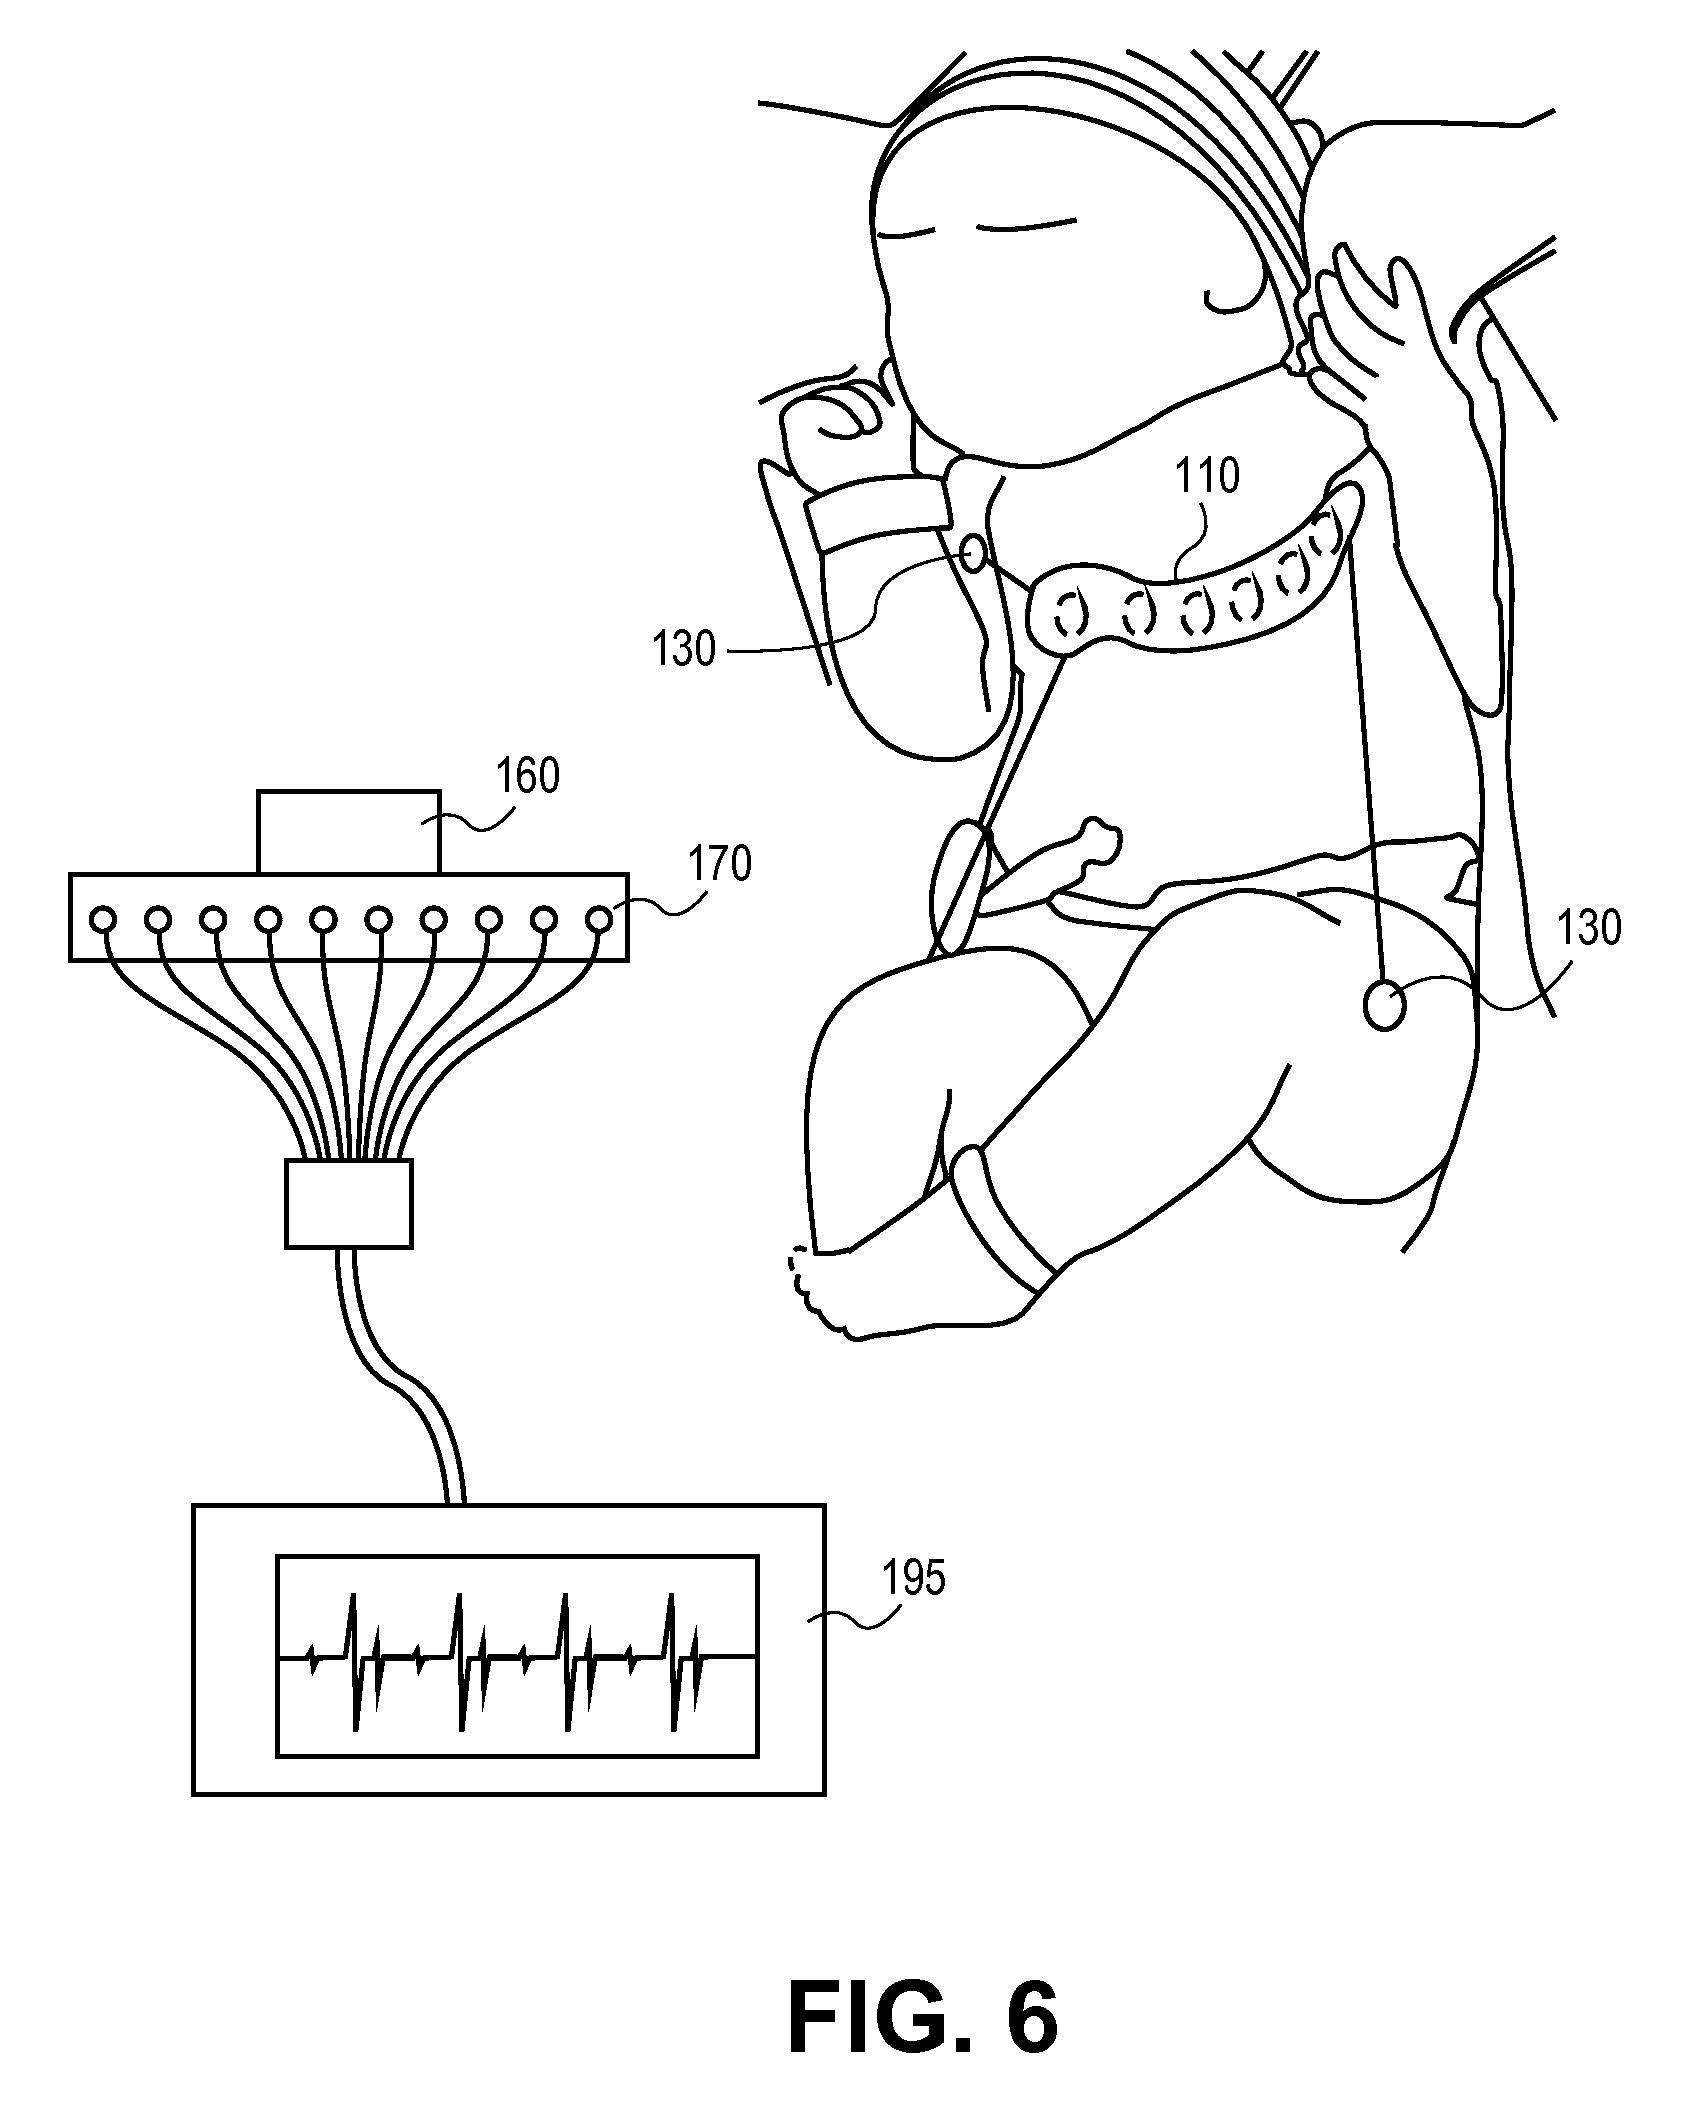 4 lead ekg placement diagram bodine b90 emergency ballast wiring patent us20110270100 ecg leads system for newborn